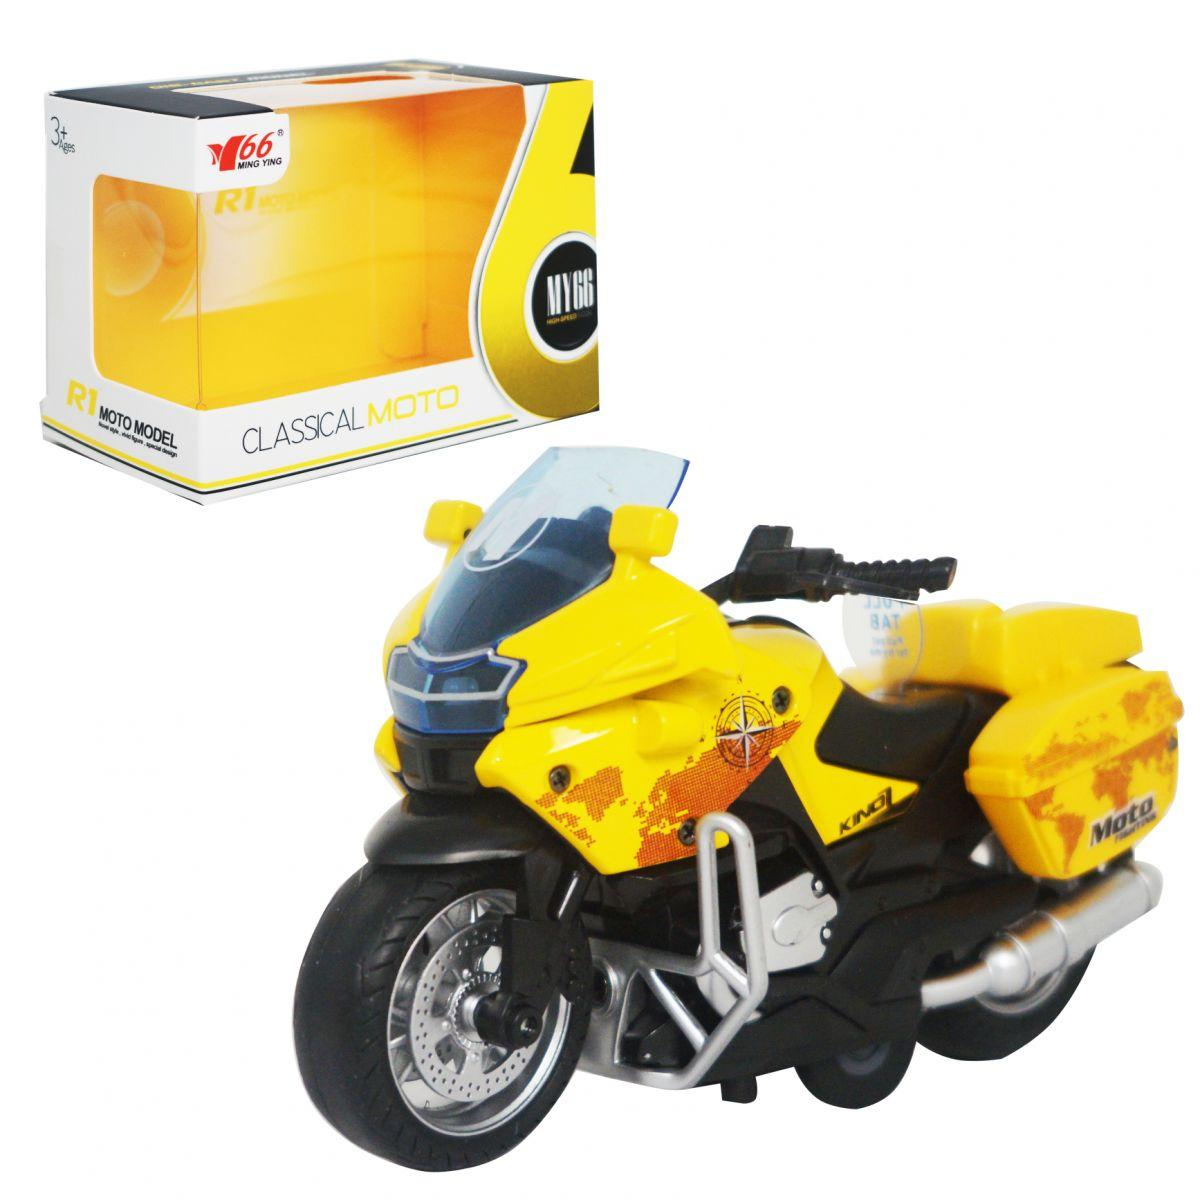 "Мотоцикл ""Classical moto"", жовтий MY66M1217"